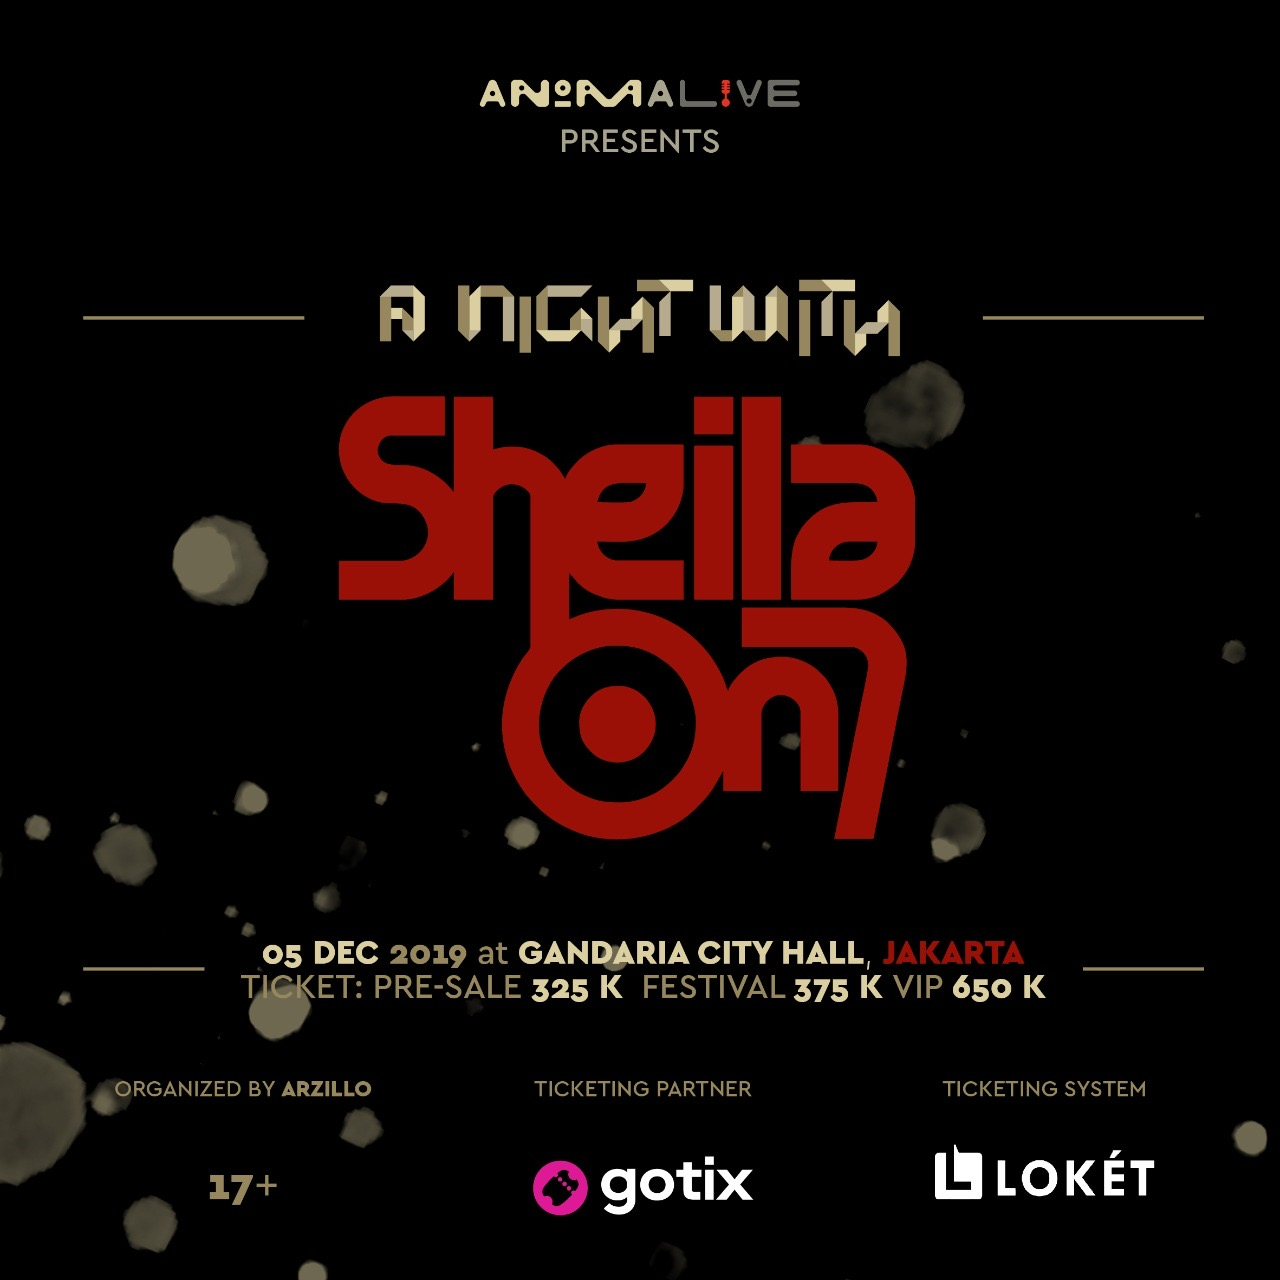 Sheila on 7 Gelar Konser Intim Awal Desember 2019